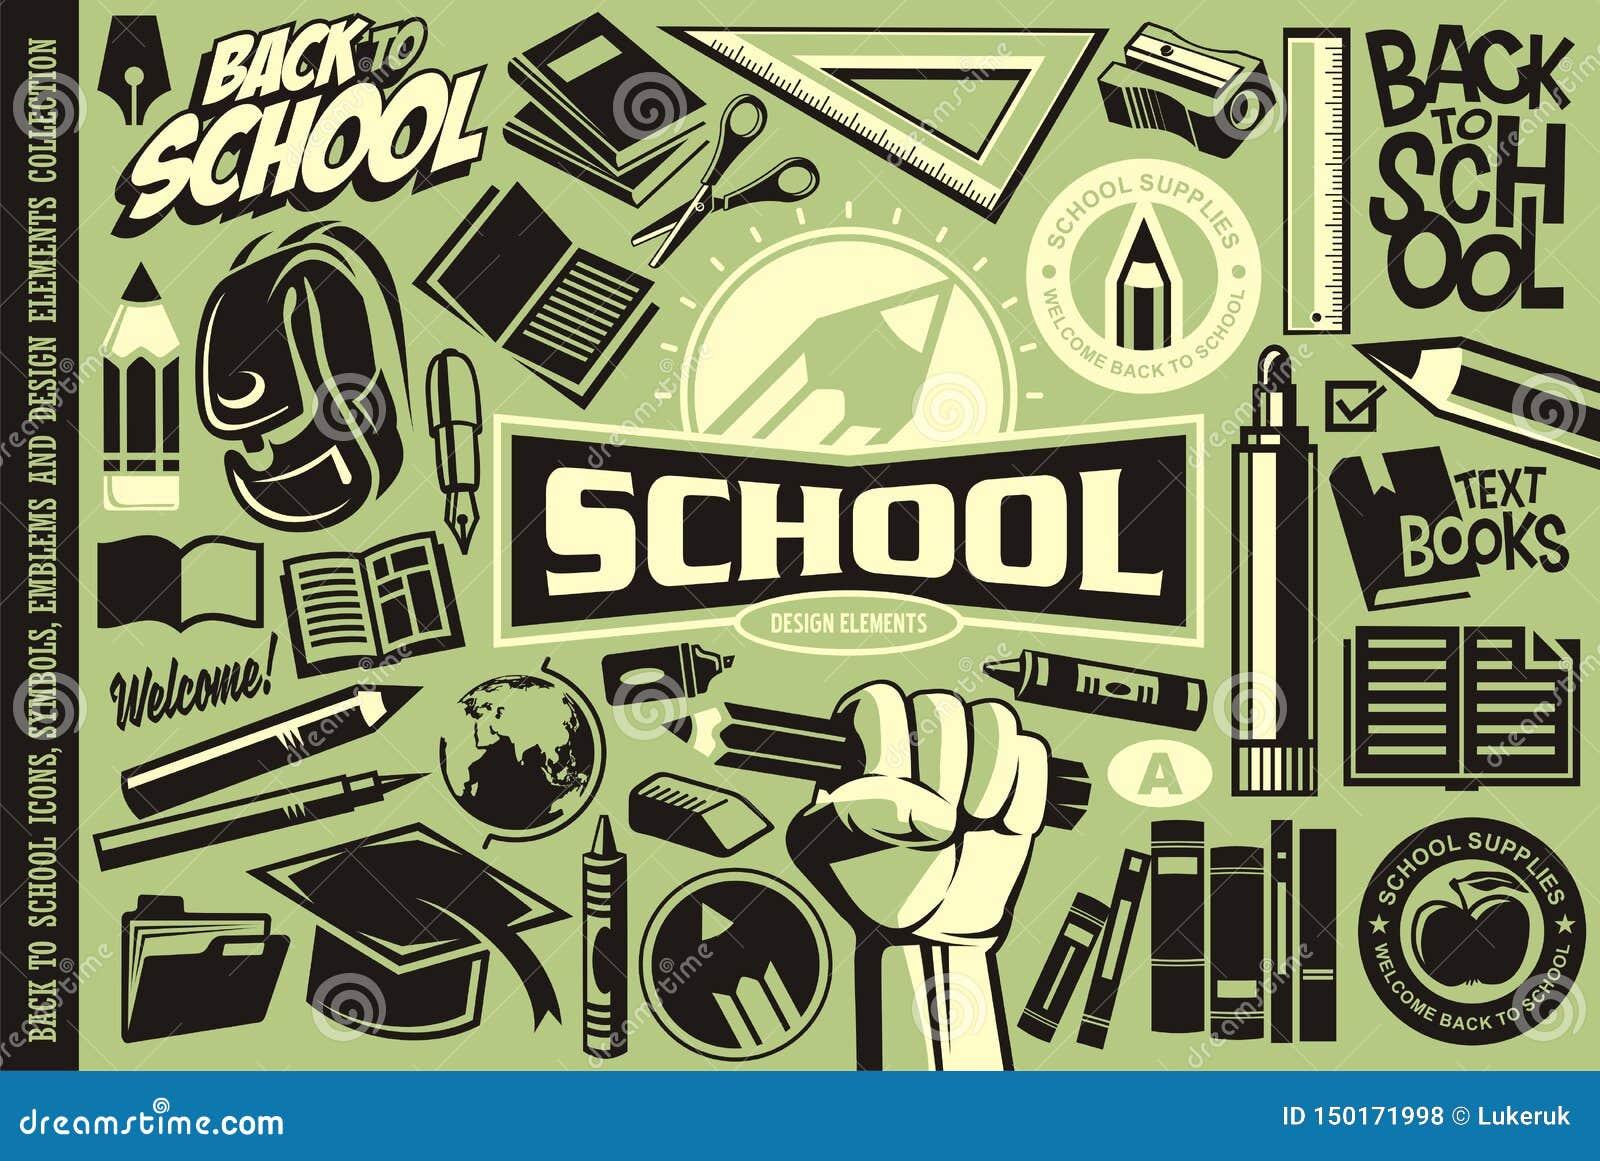 Back to school set of icons, logos, symbols, emblems and design elements